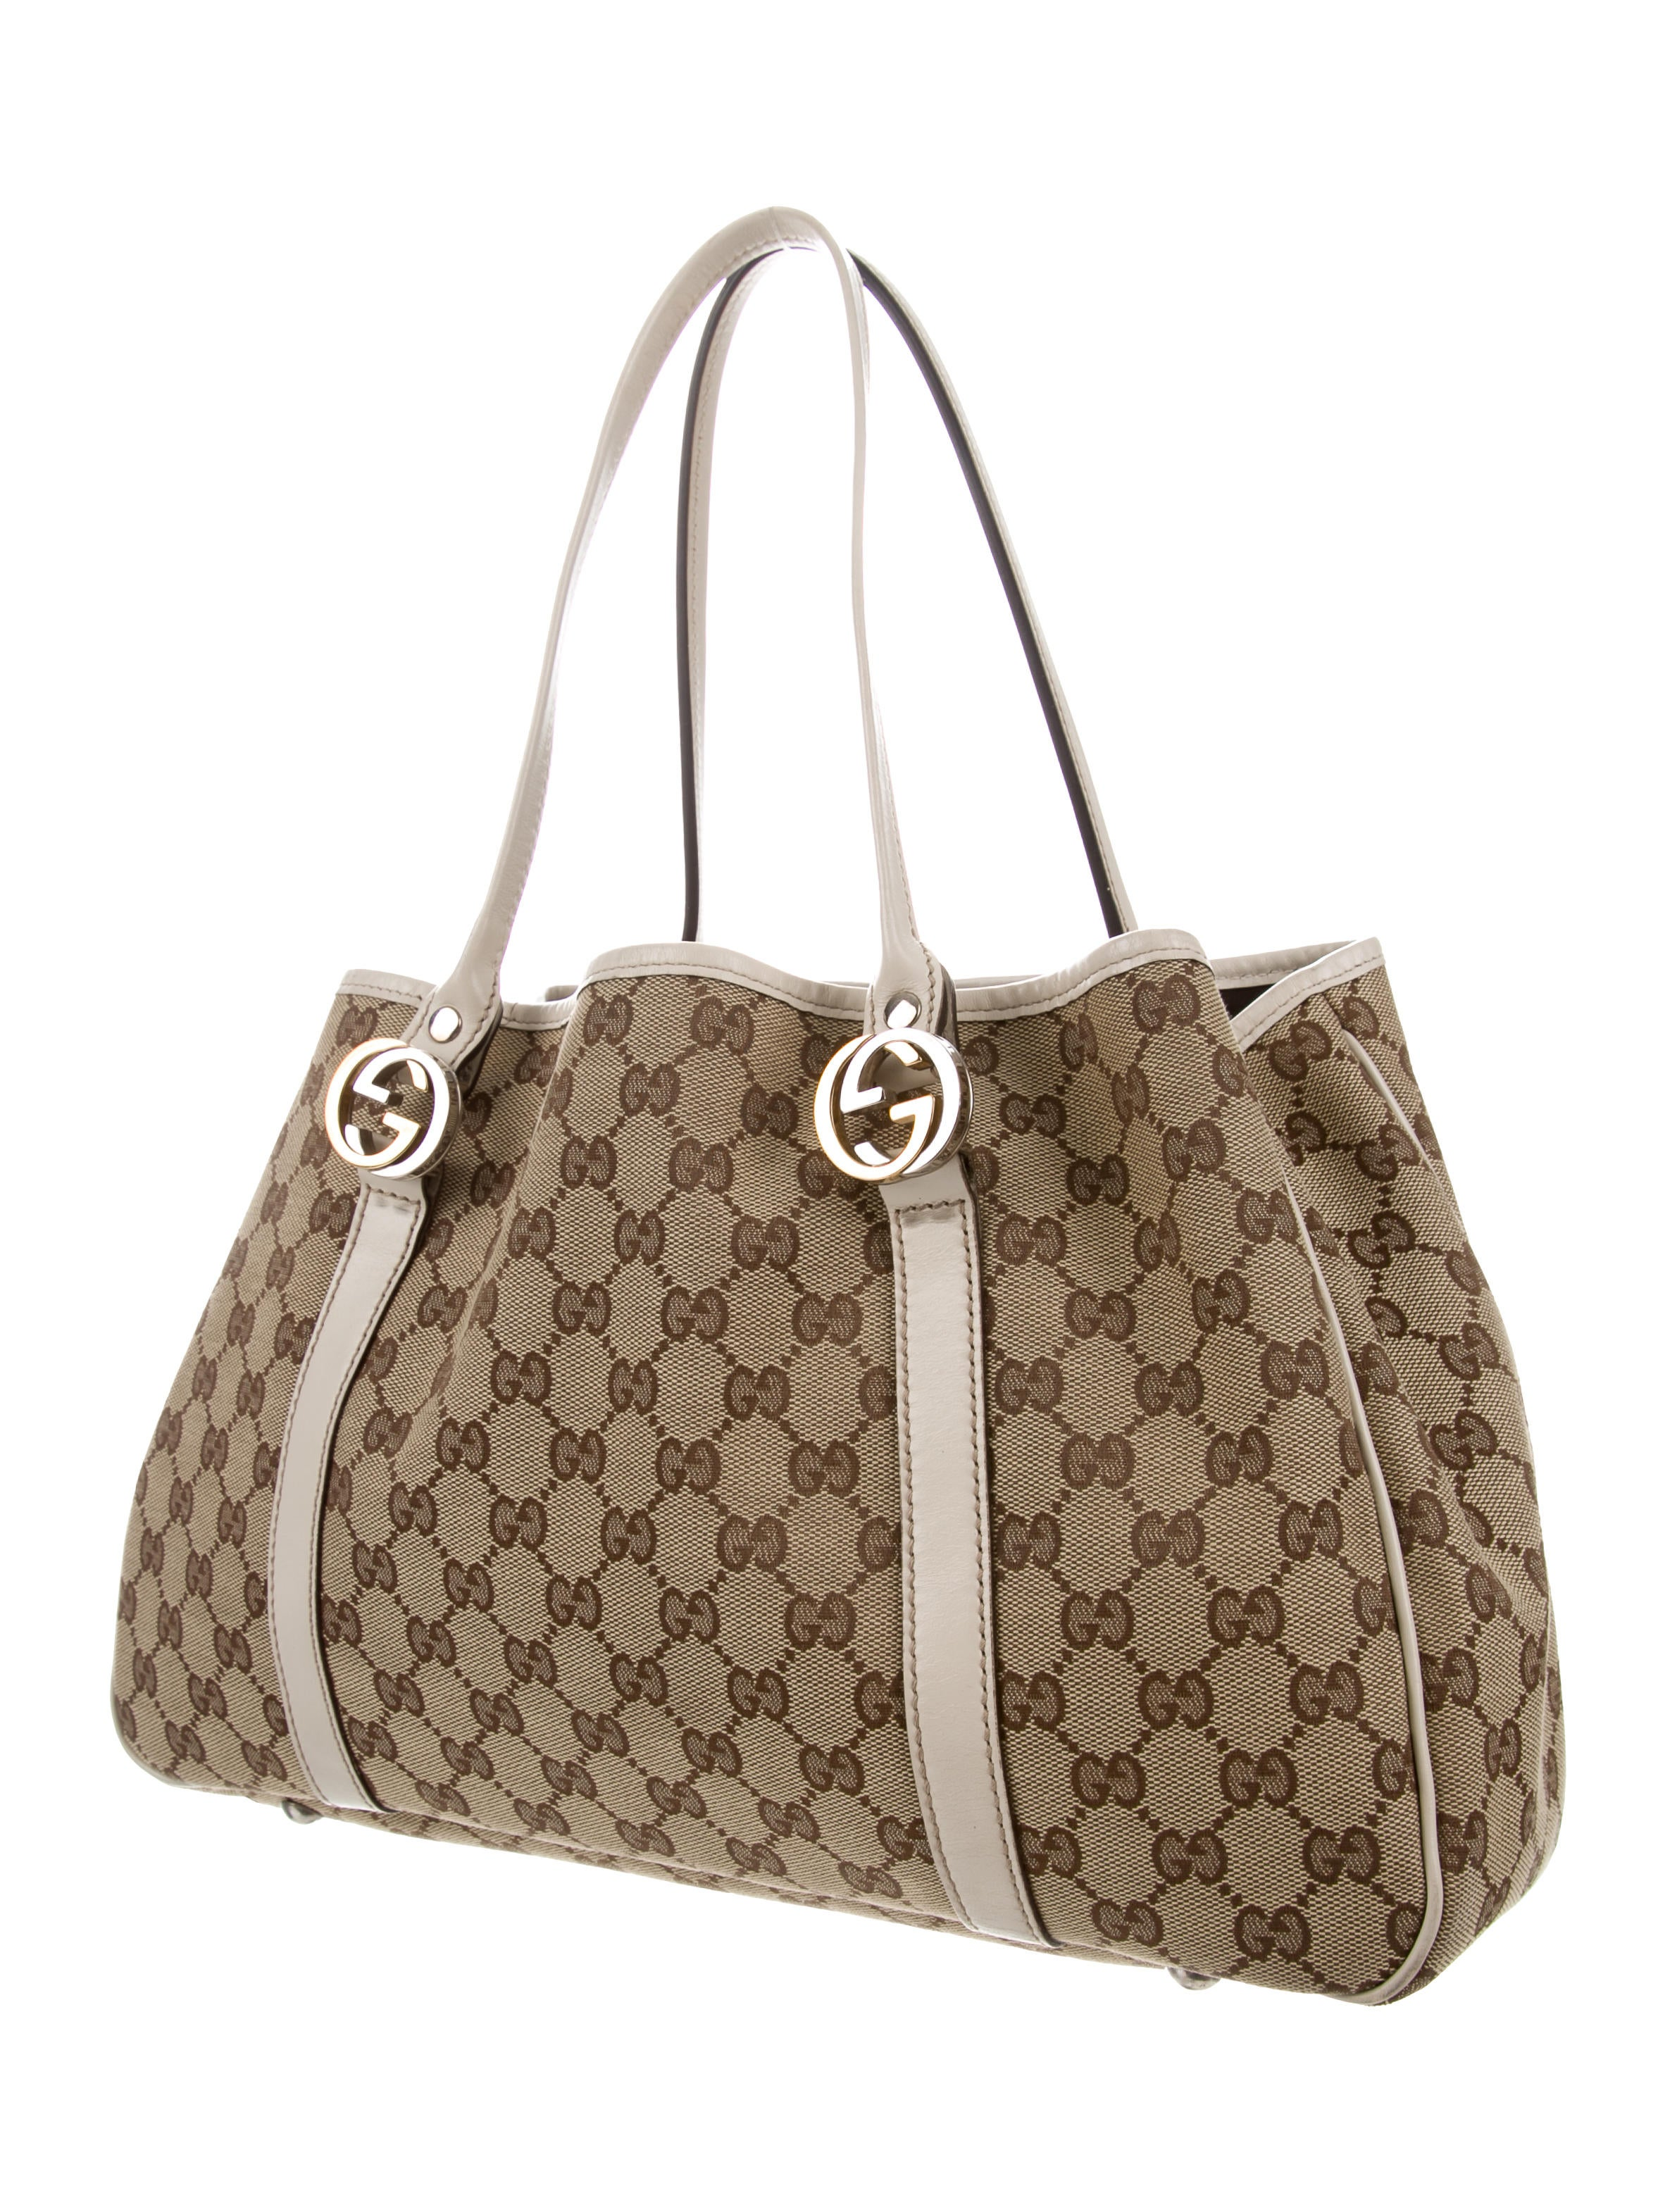 35e72251445 Gucci GG Twins Medium Tote - Handbags - GUC288236